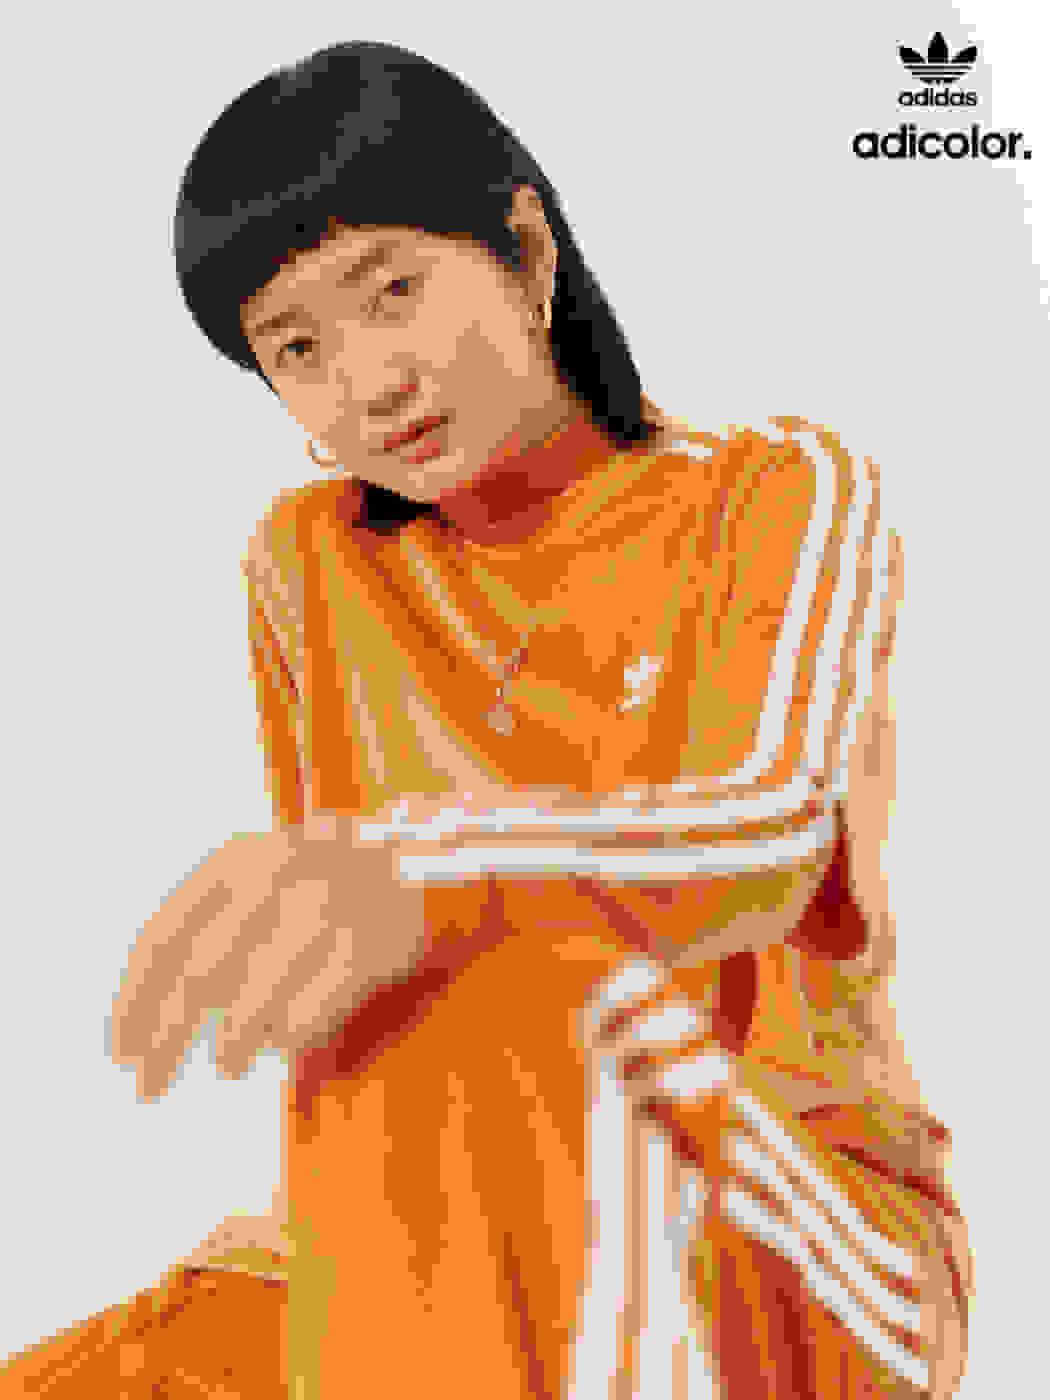 Stylish woman wearing classic orange adicolor outfit.